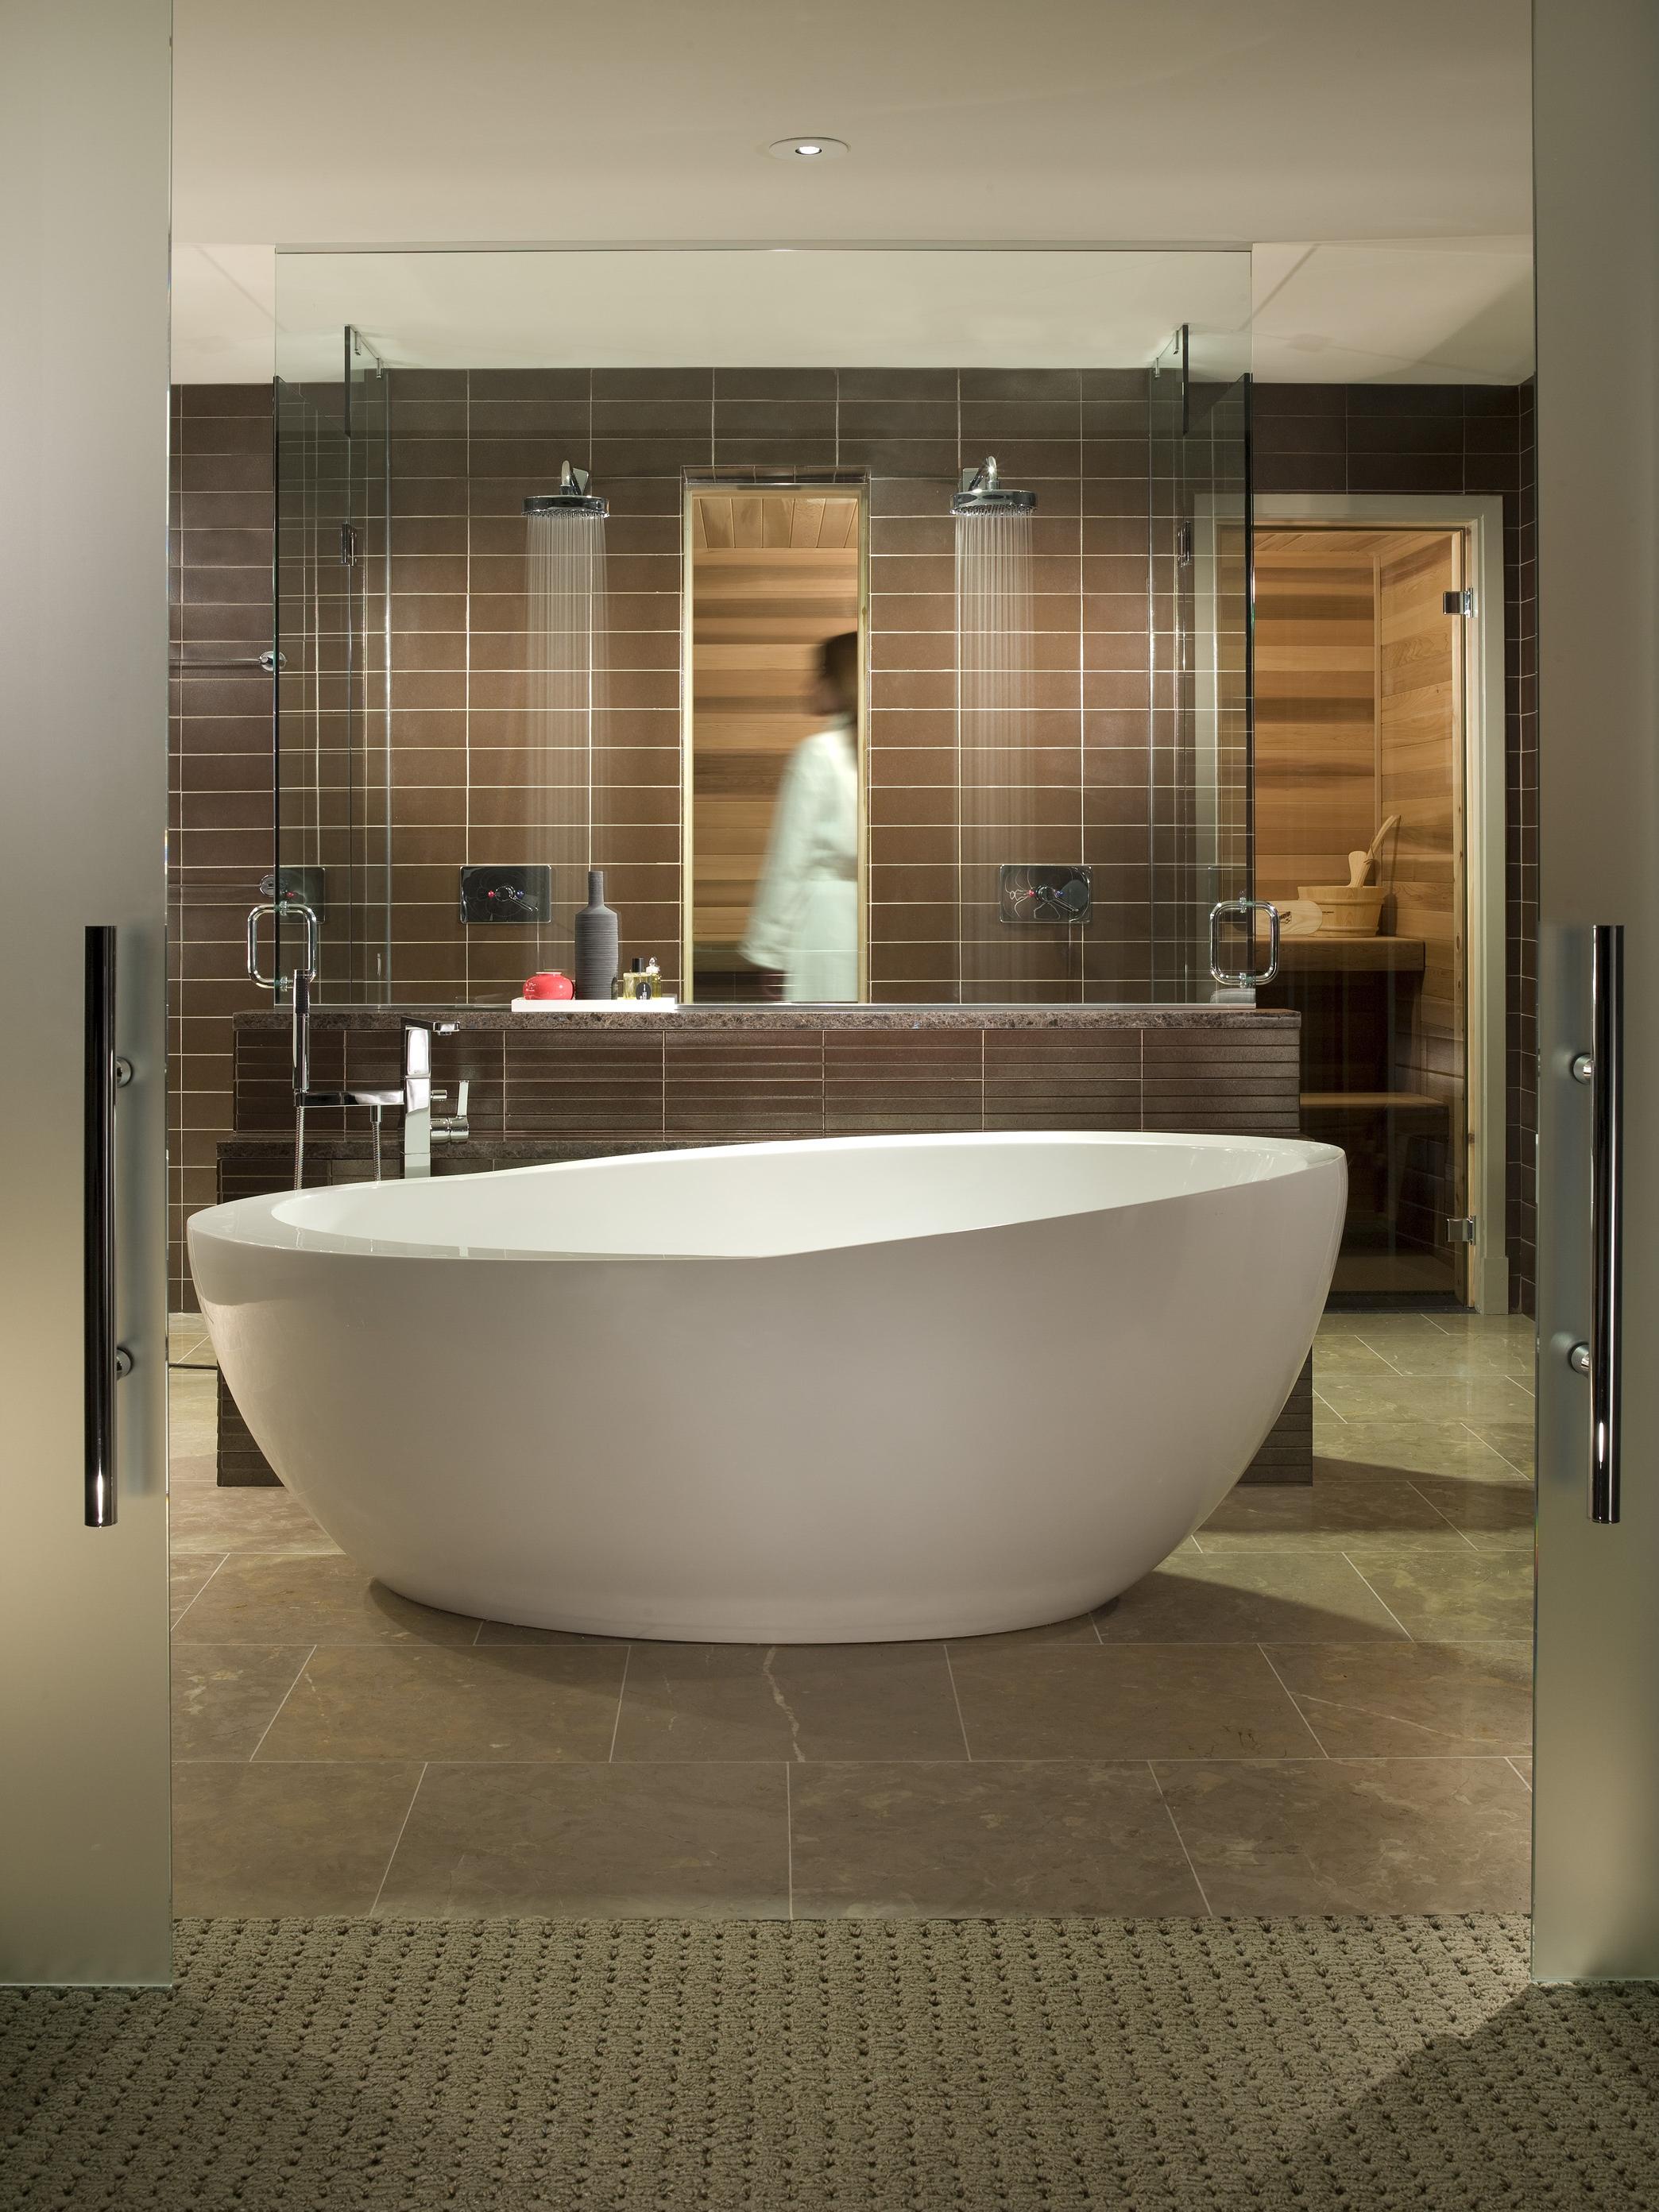 Intercontinental Chicago O'Hare Suite Bathroom